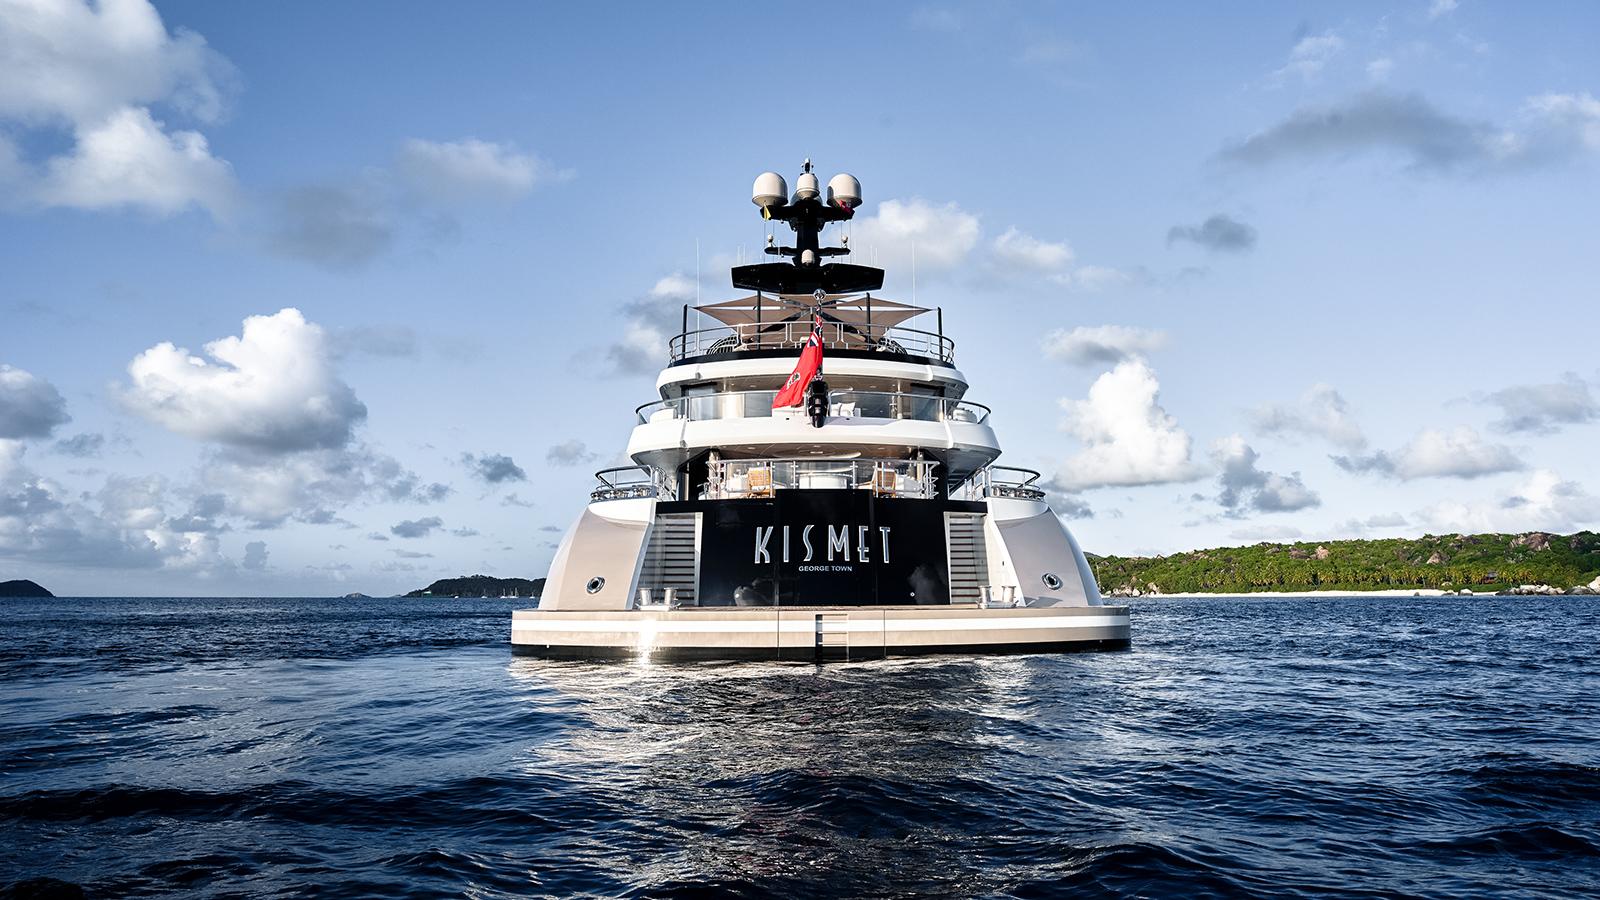 kismet-yacht-aft-view